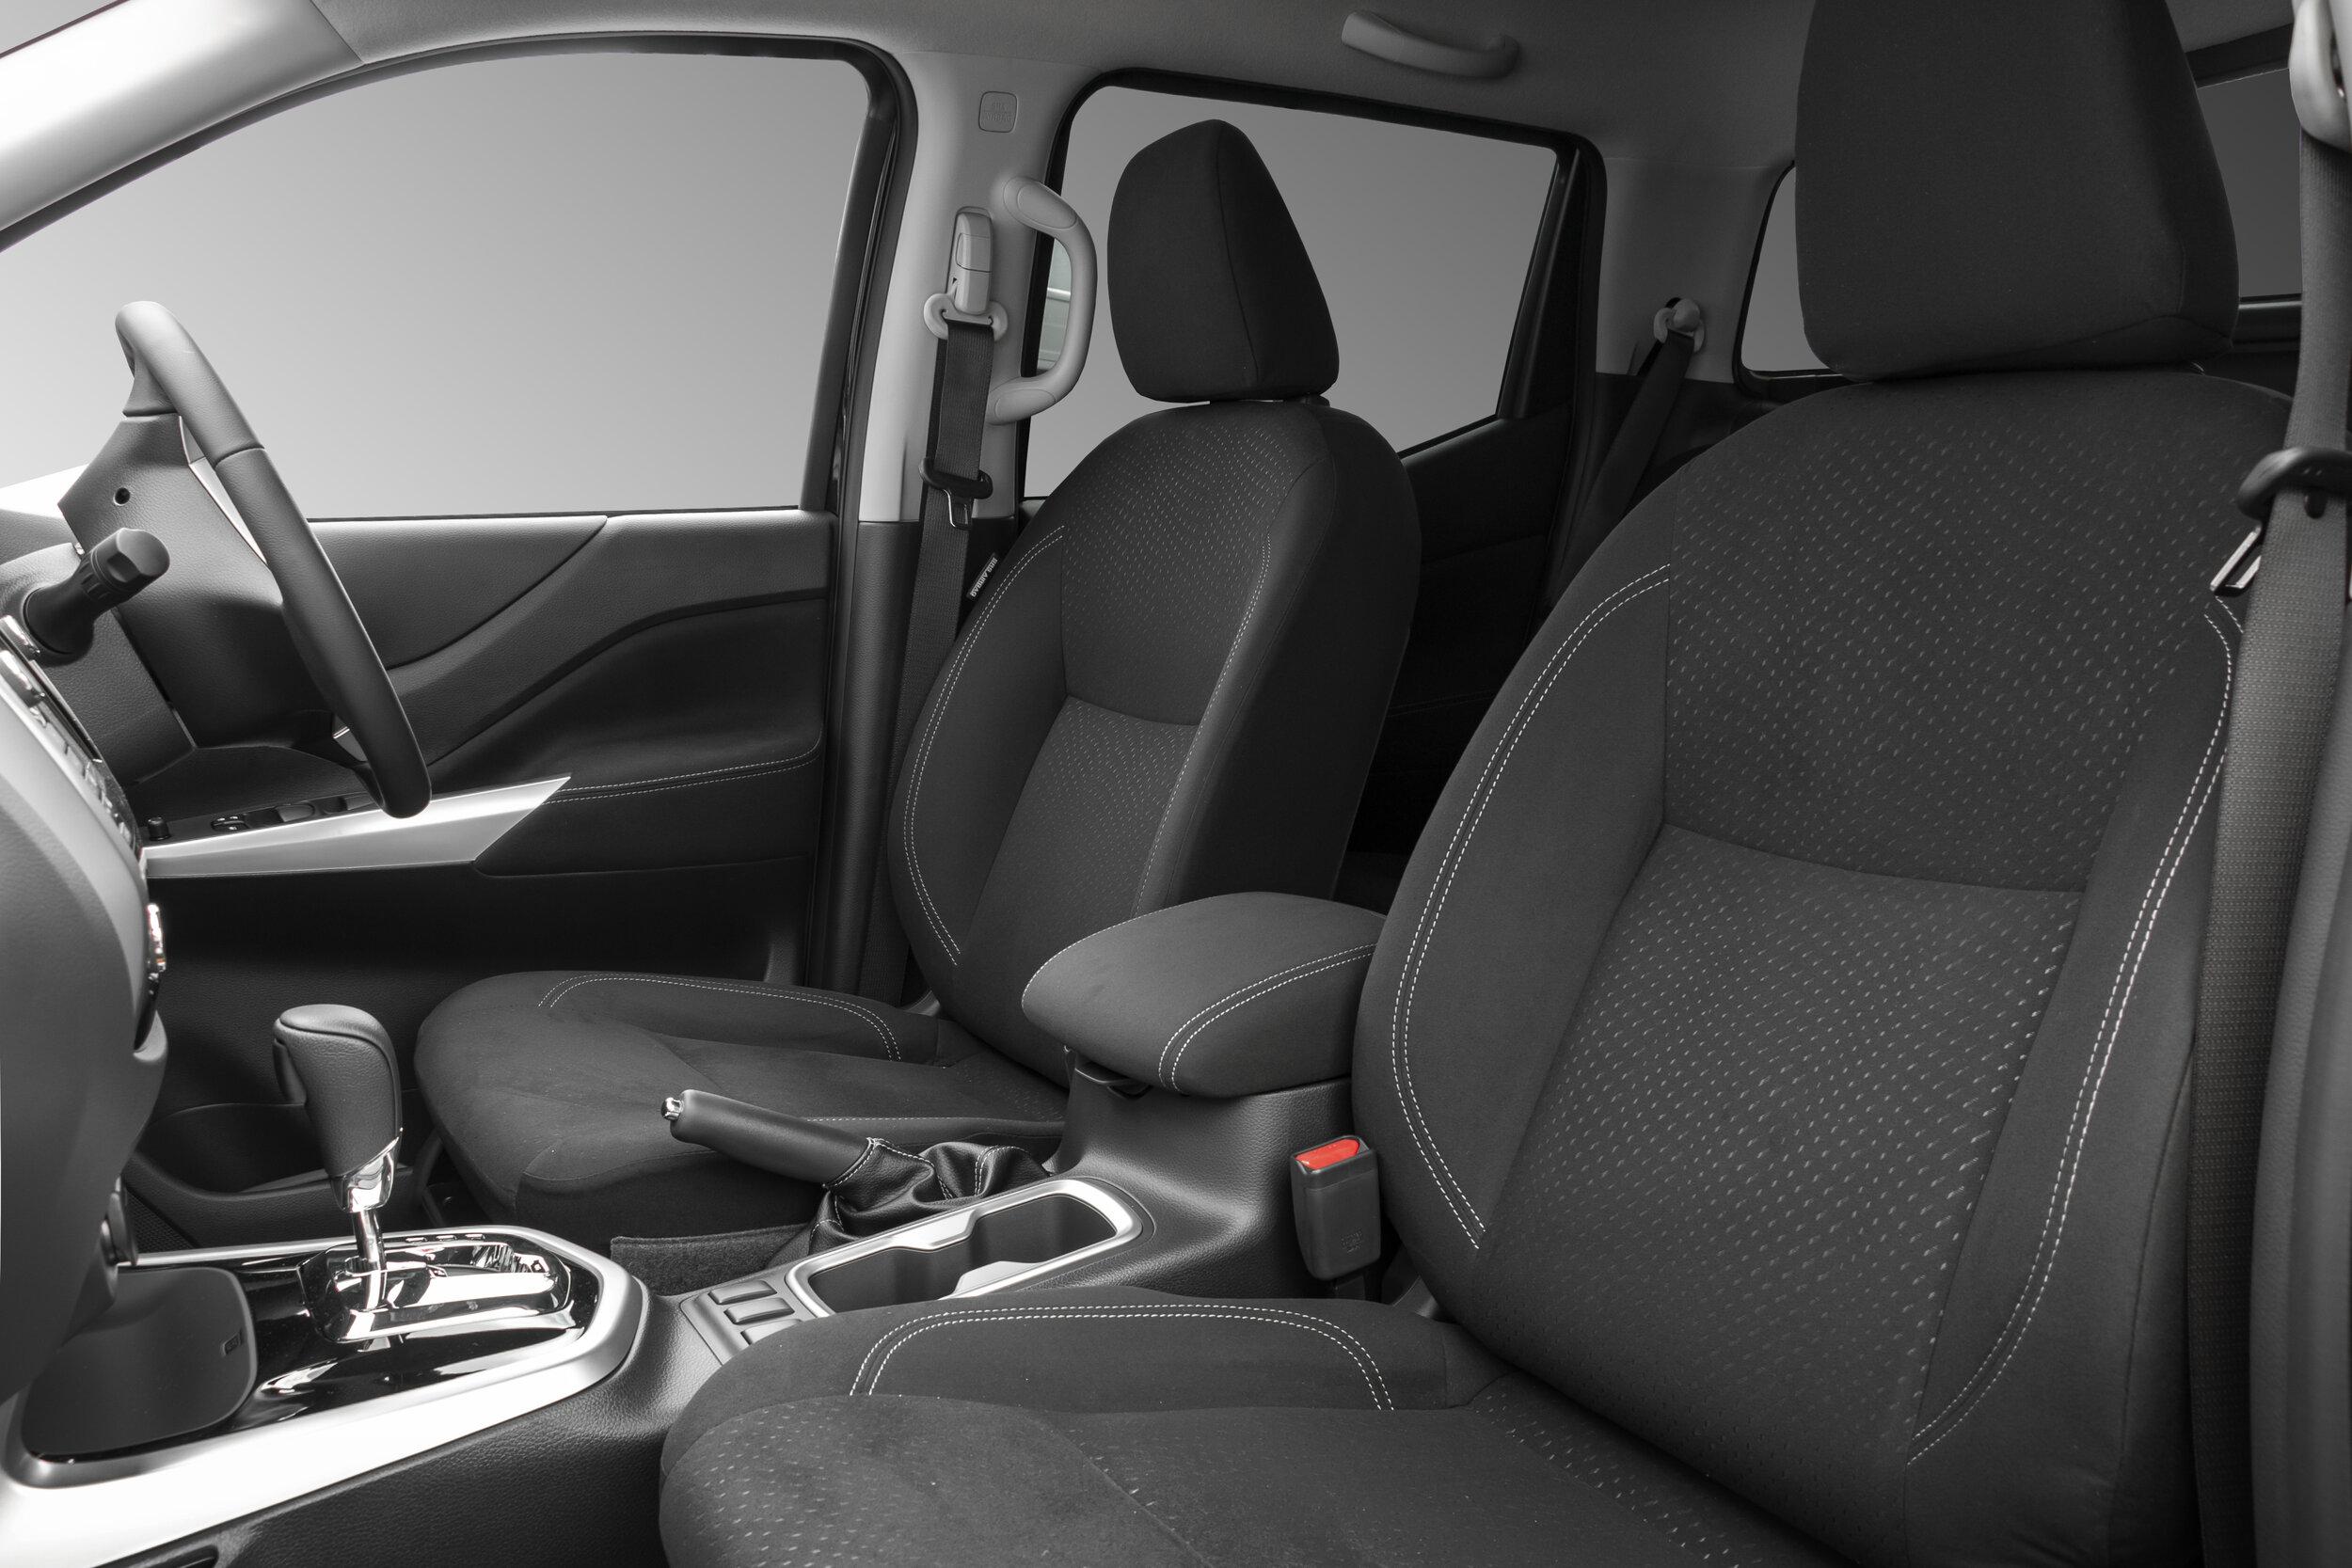 SLIDER-IMAGE-RVE-Nissan-Navara-Standard-Factory-Cloth-Interior.jpg